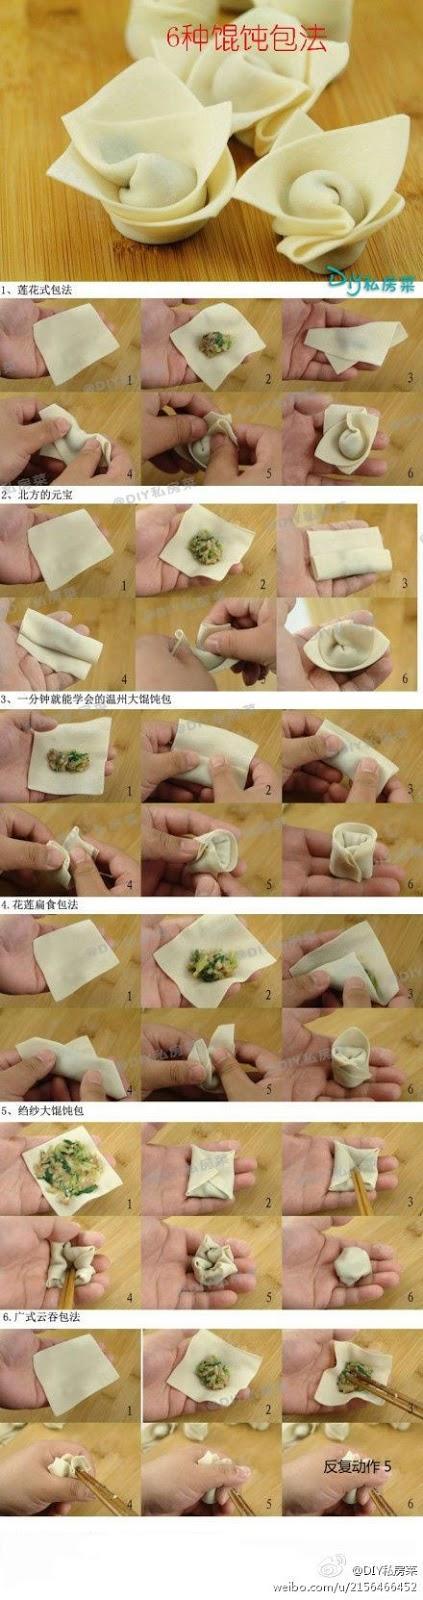 Won ton aux châtaignes d'eau 猪肉荸荠馄饨 zhūròu bíqi húntun